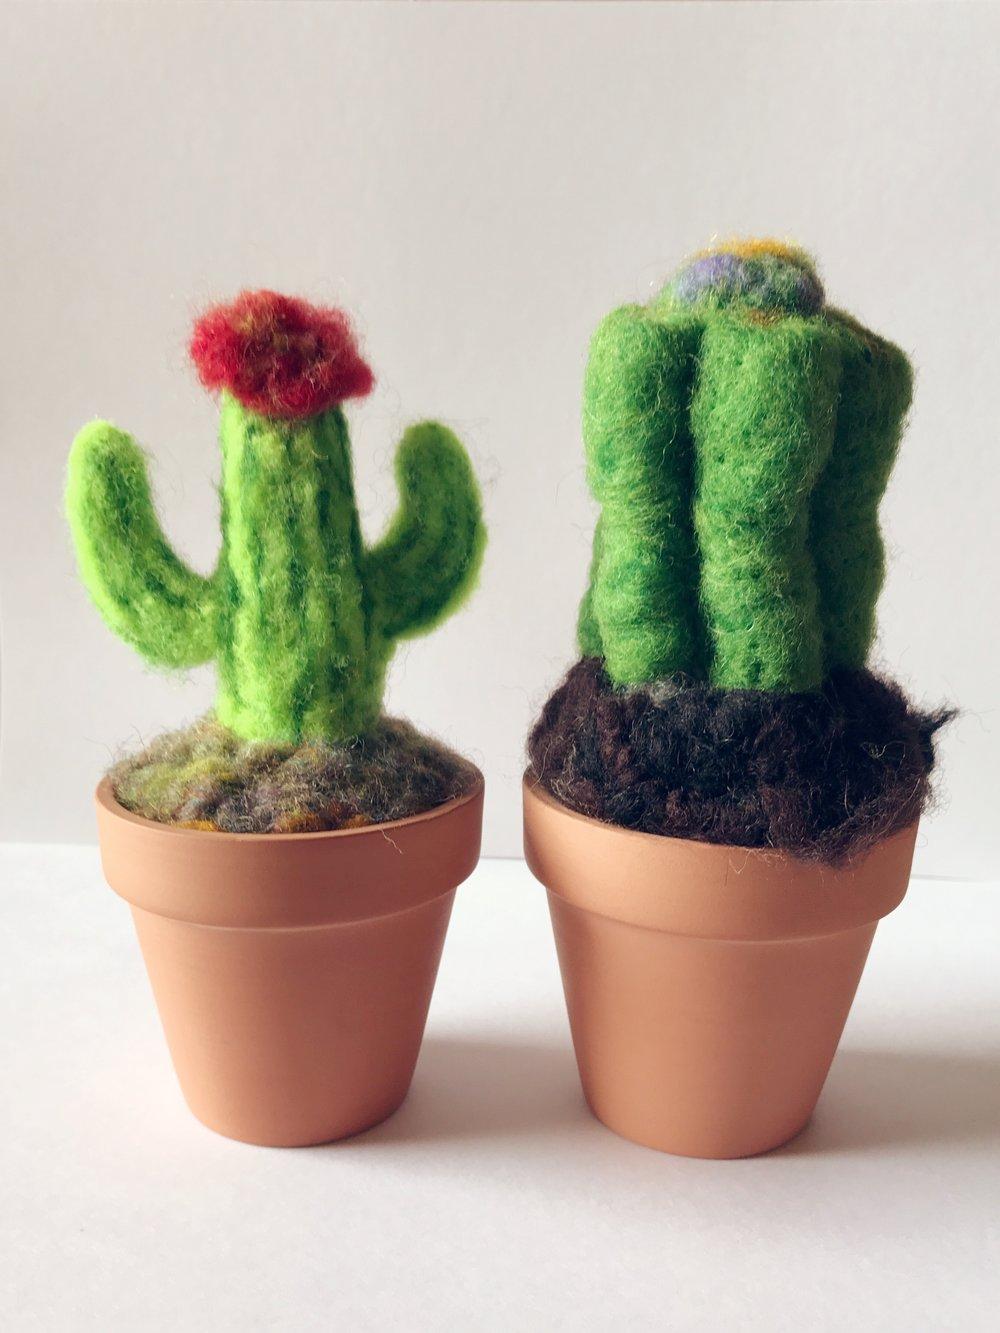 Cecilia Ho, Cactus Wool Sculpture